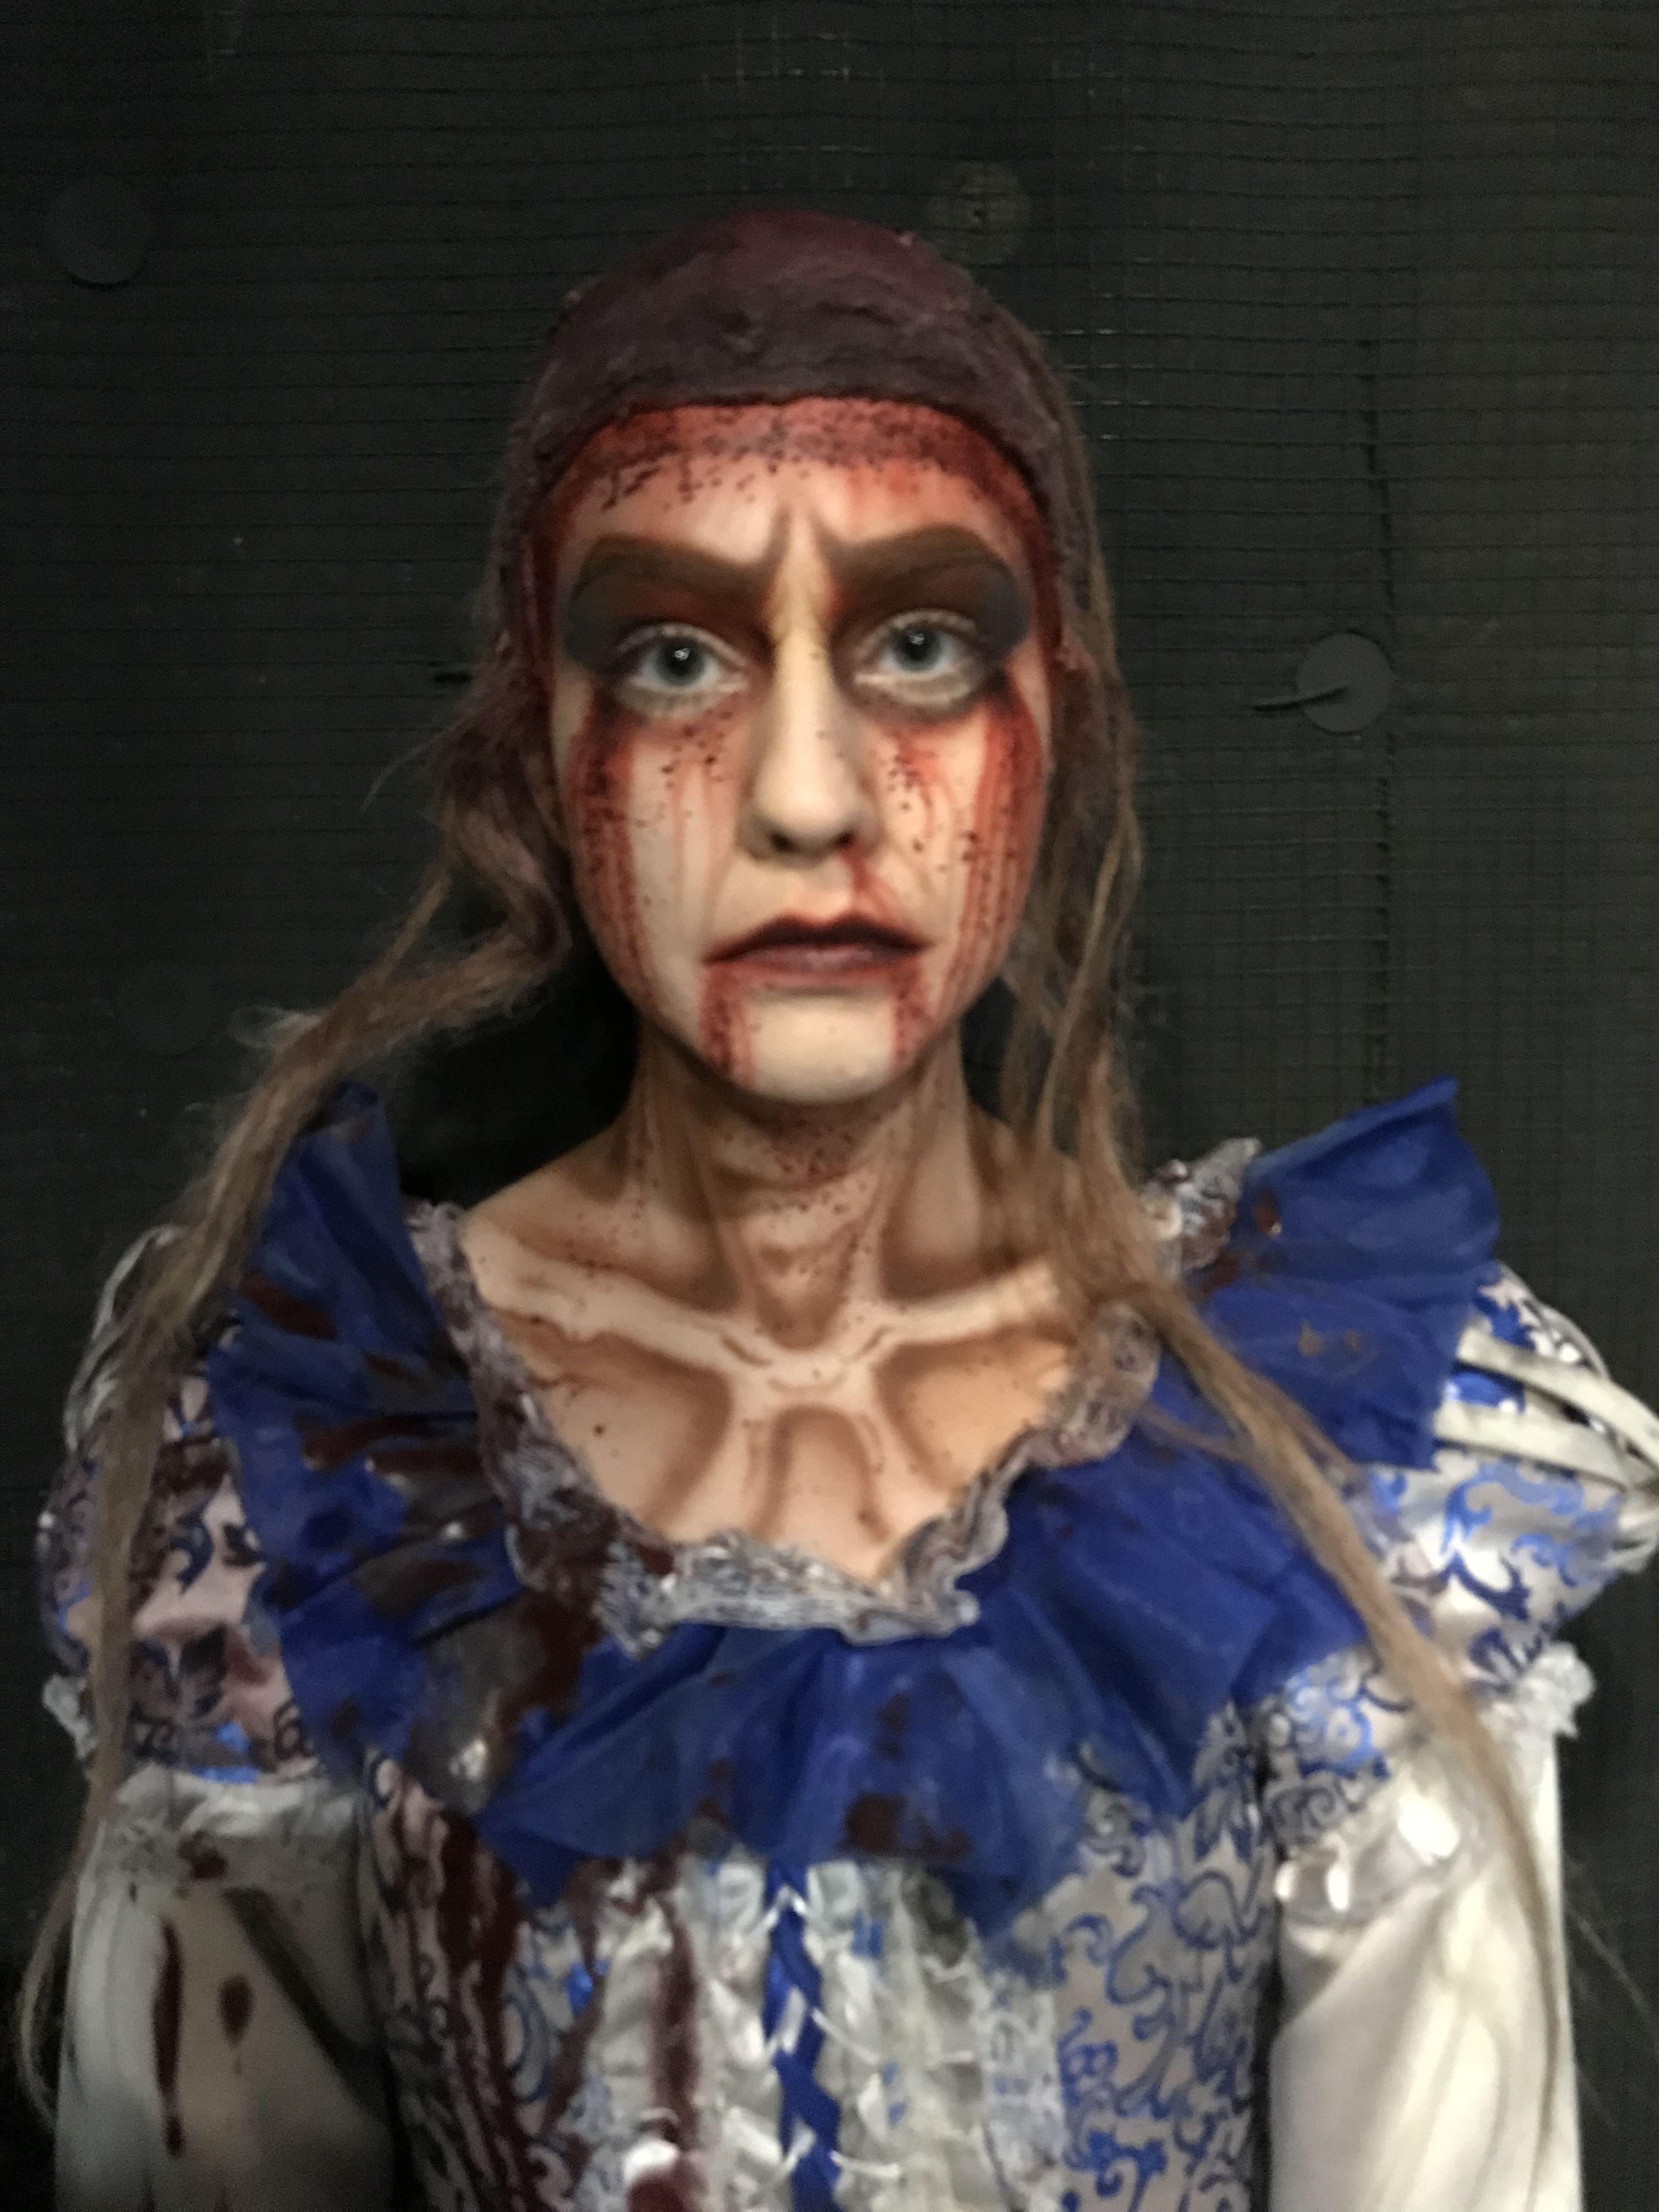 Pin by Edgar Garayúa on Airbrush & FX Make Up Halloween